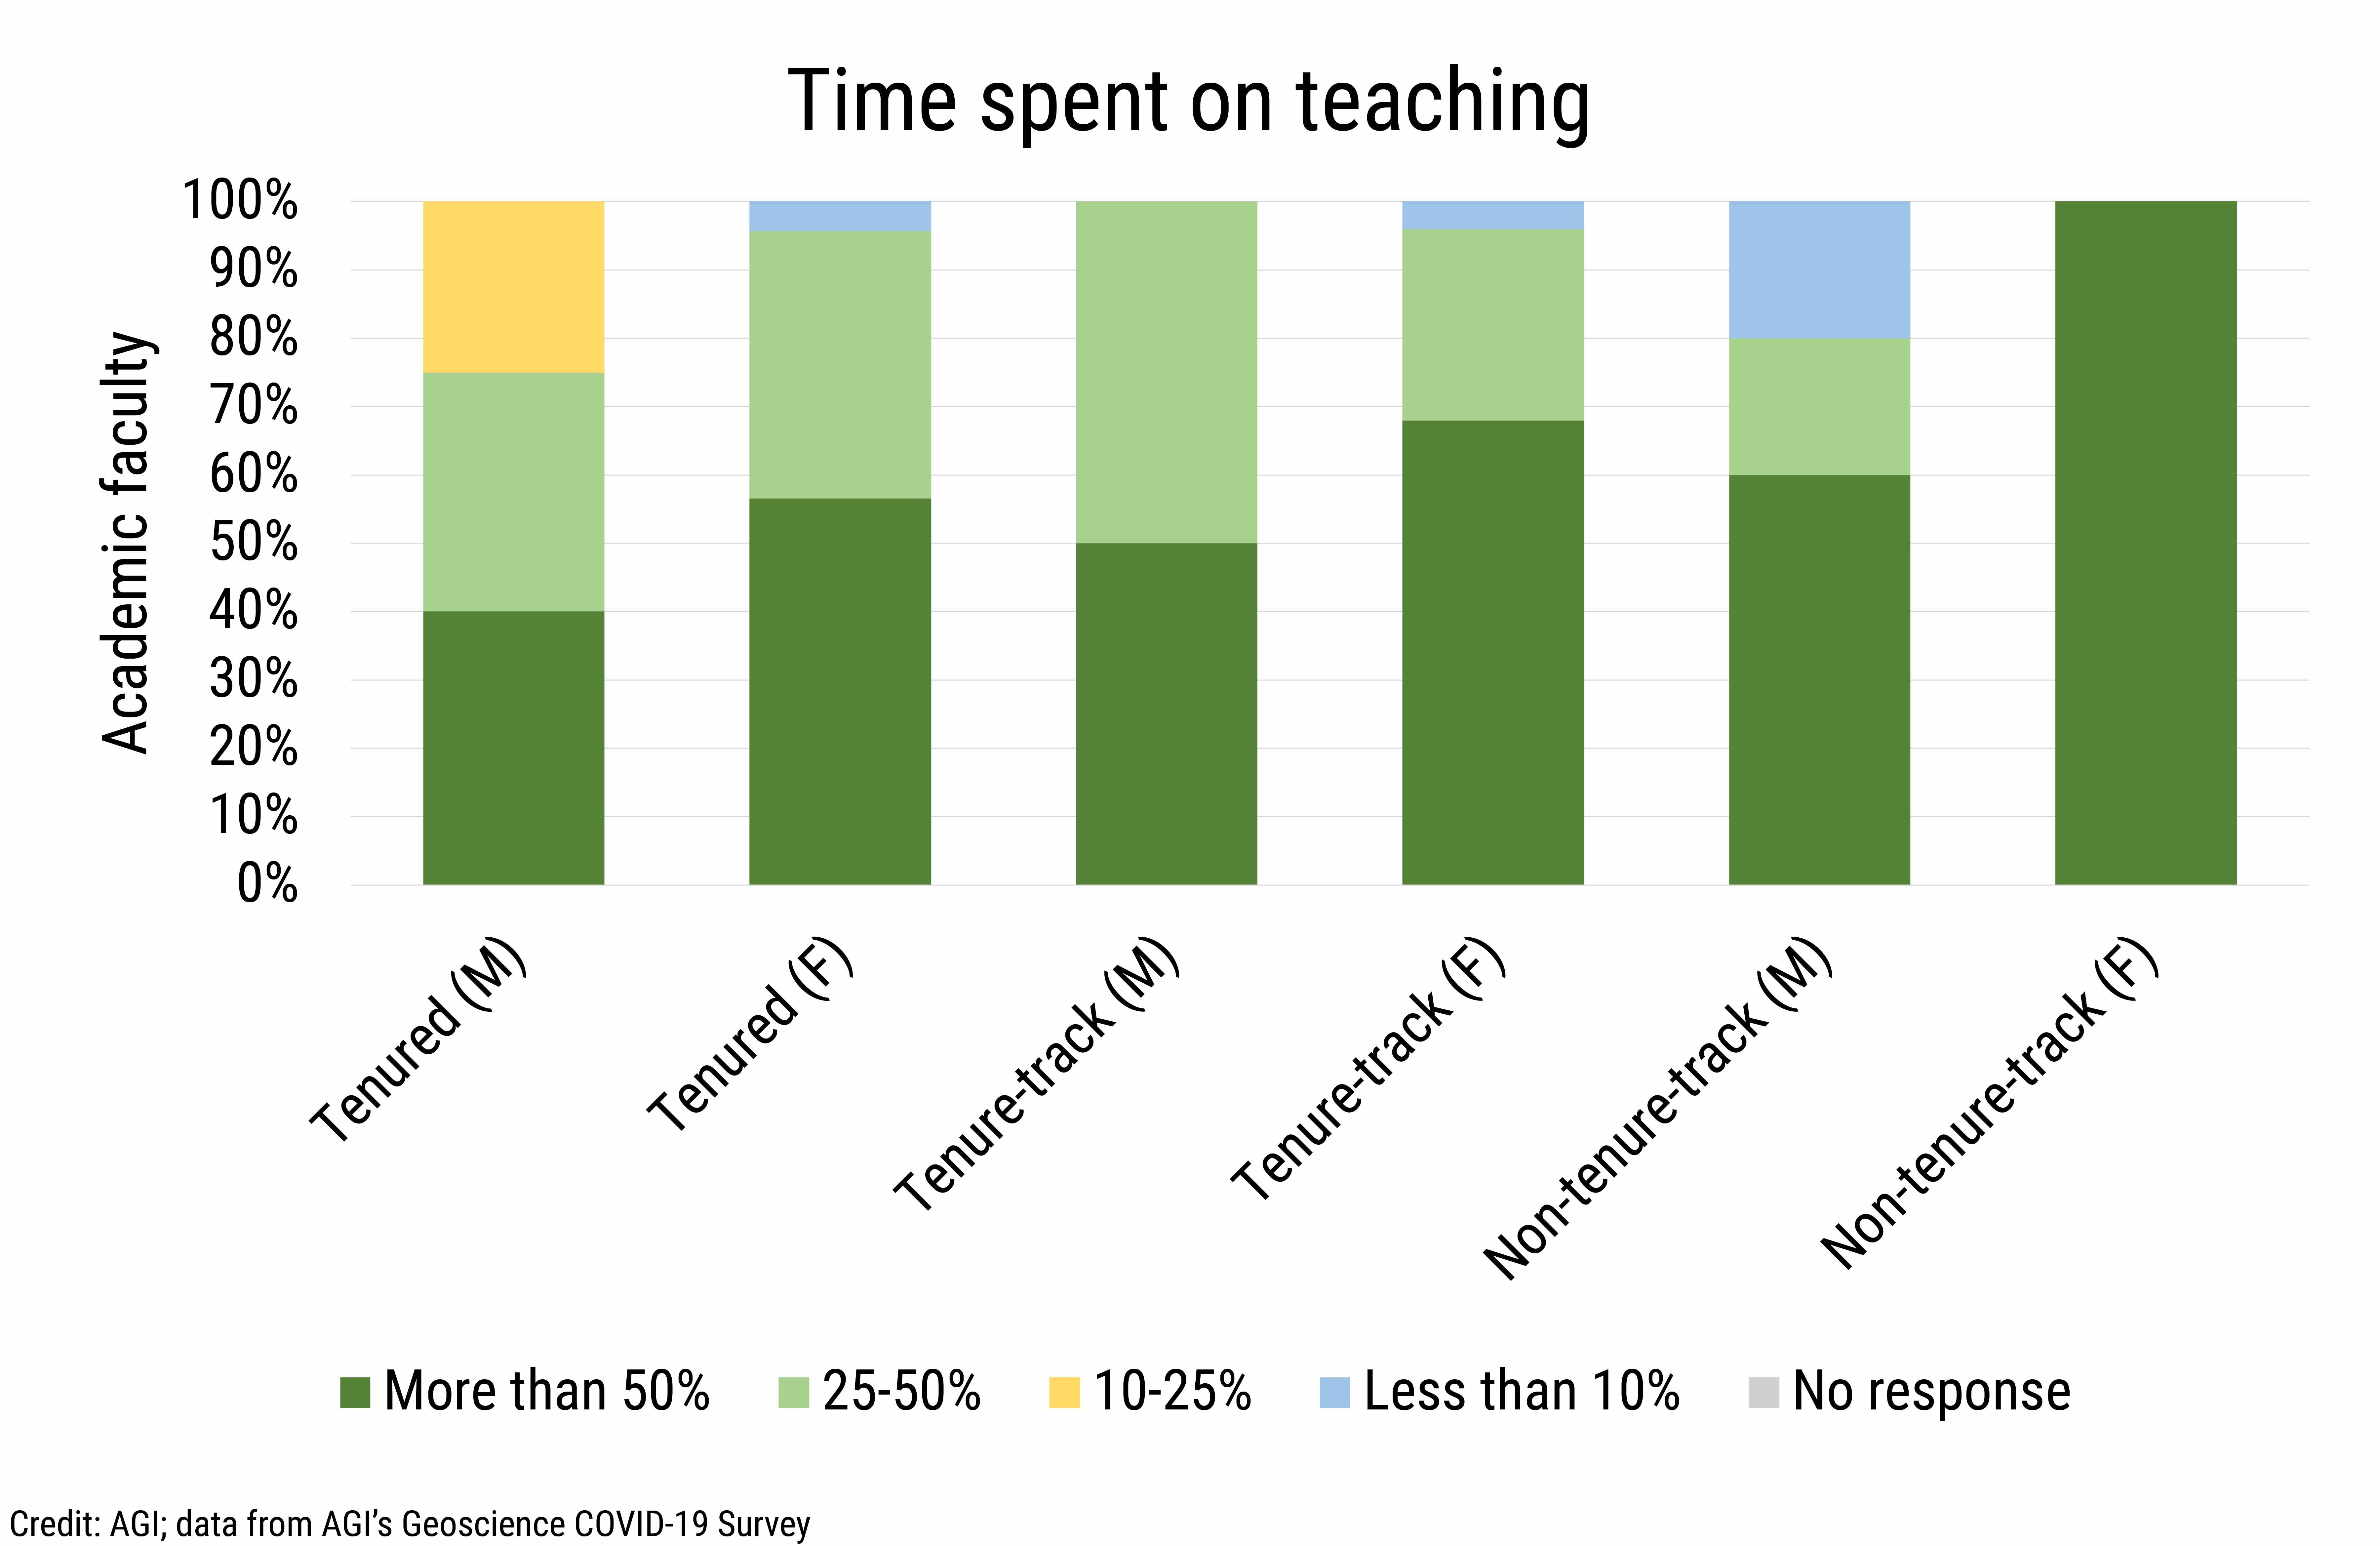 DB_2021-019 chart 04: Time spent on teaching (Credit: AGI; data from AGI's Geoscience COVID-19 Survey)